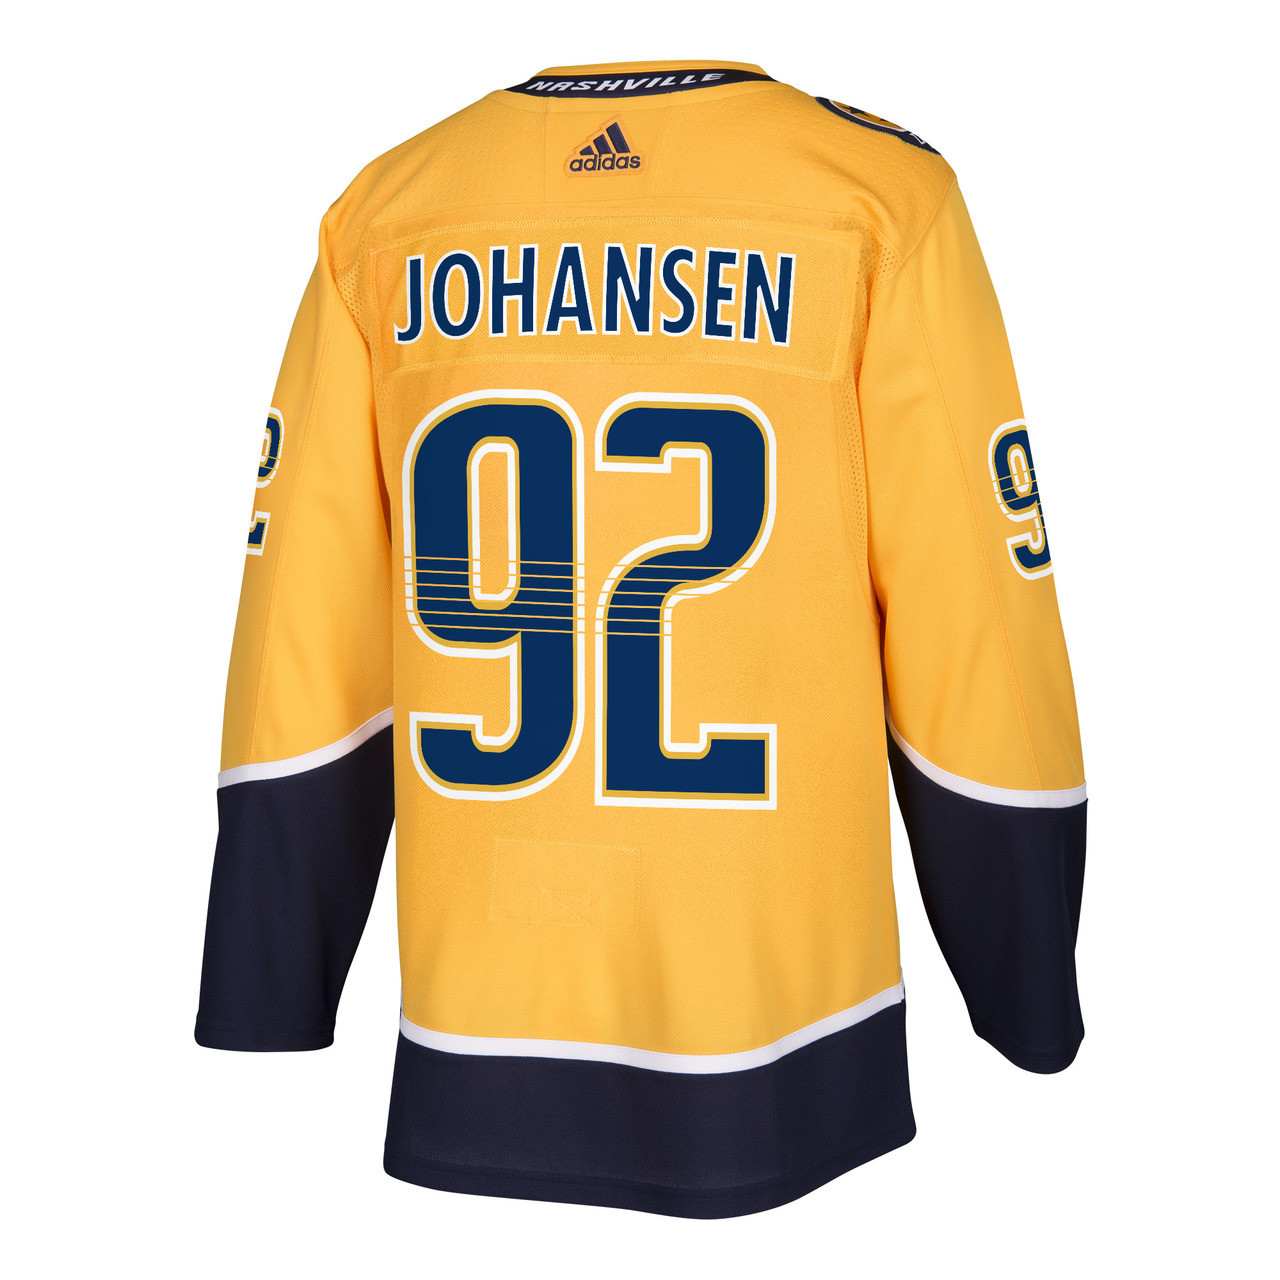 Nashville Predators Adidas Authentic Ryan Johansen Jersey Home Gold ... 117daa196